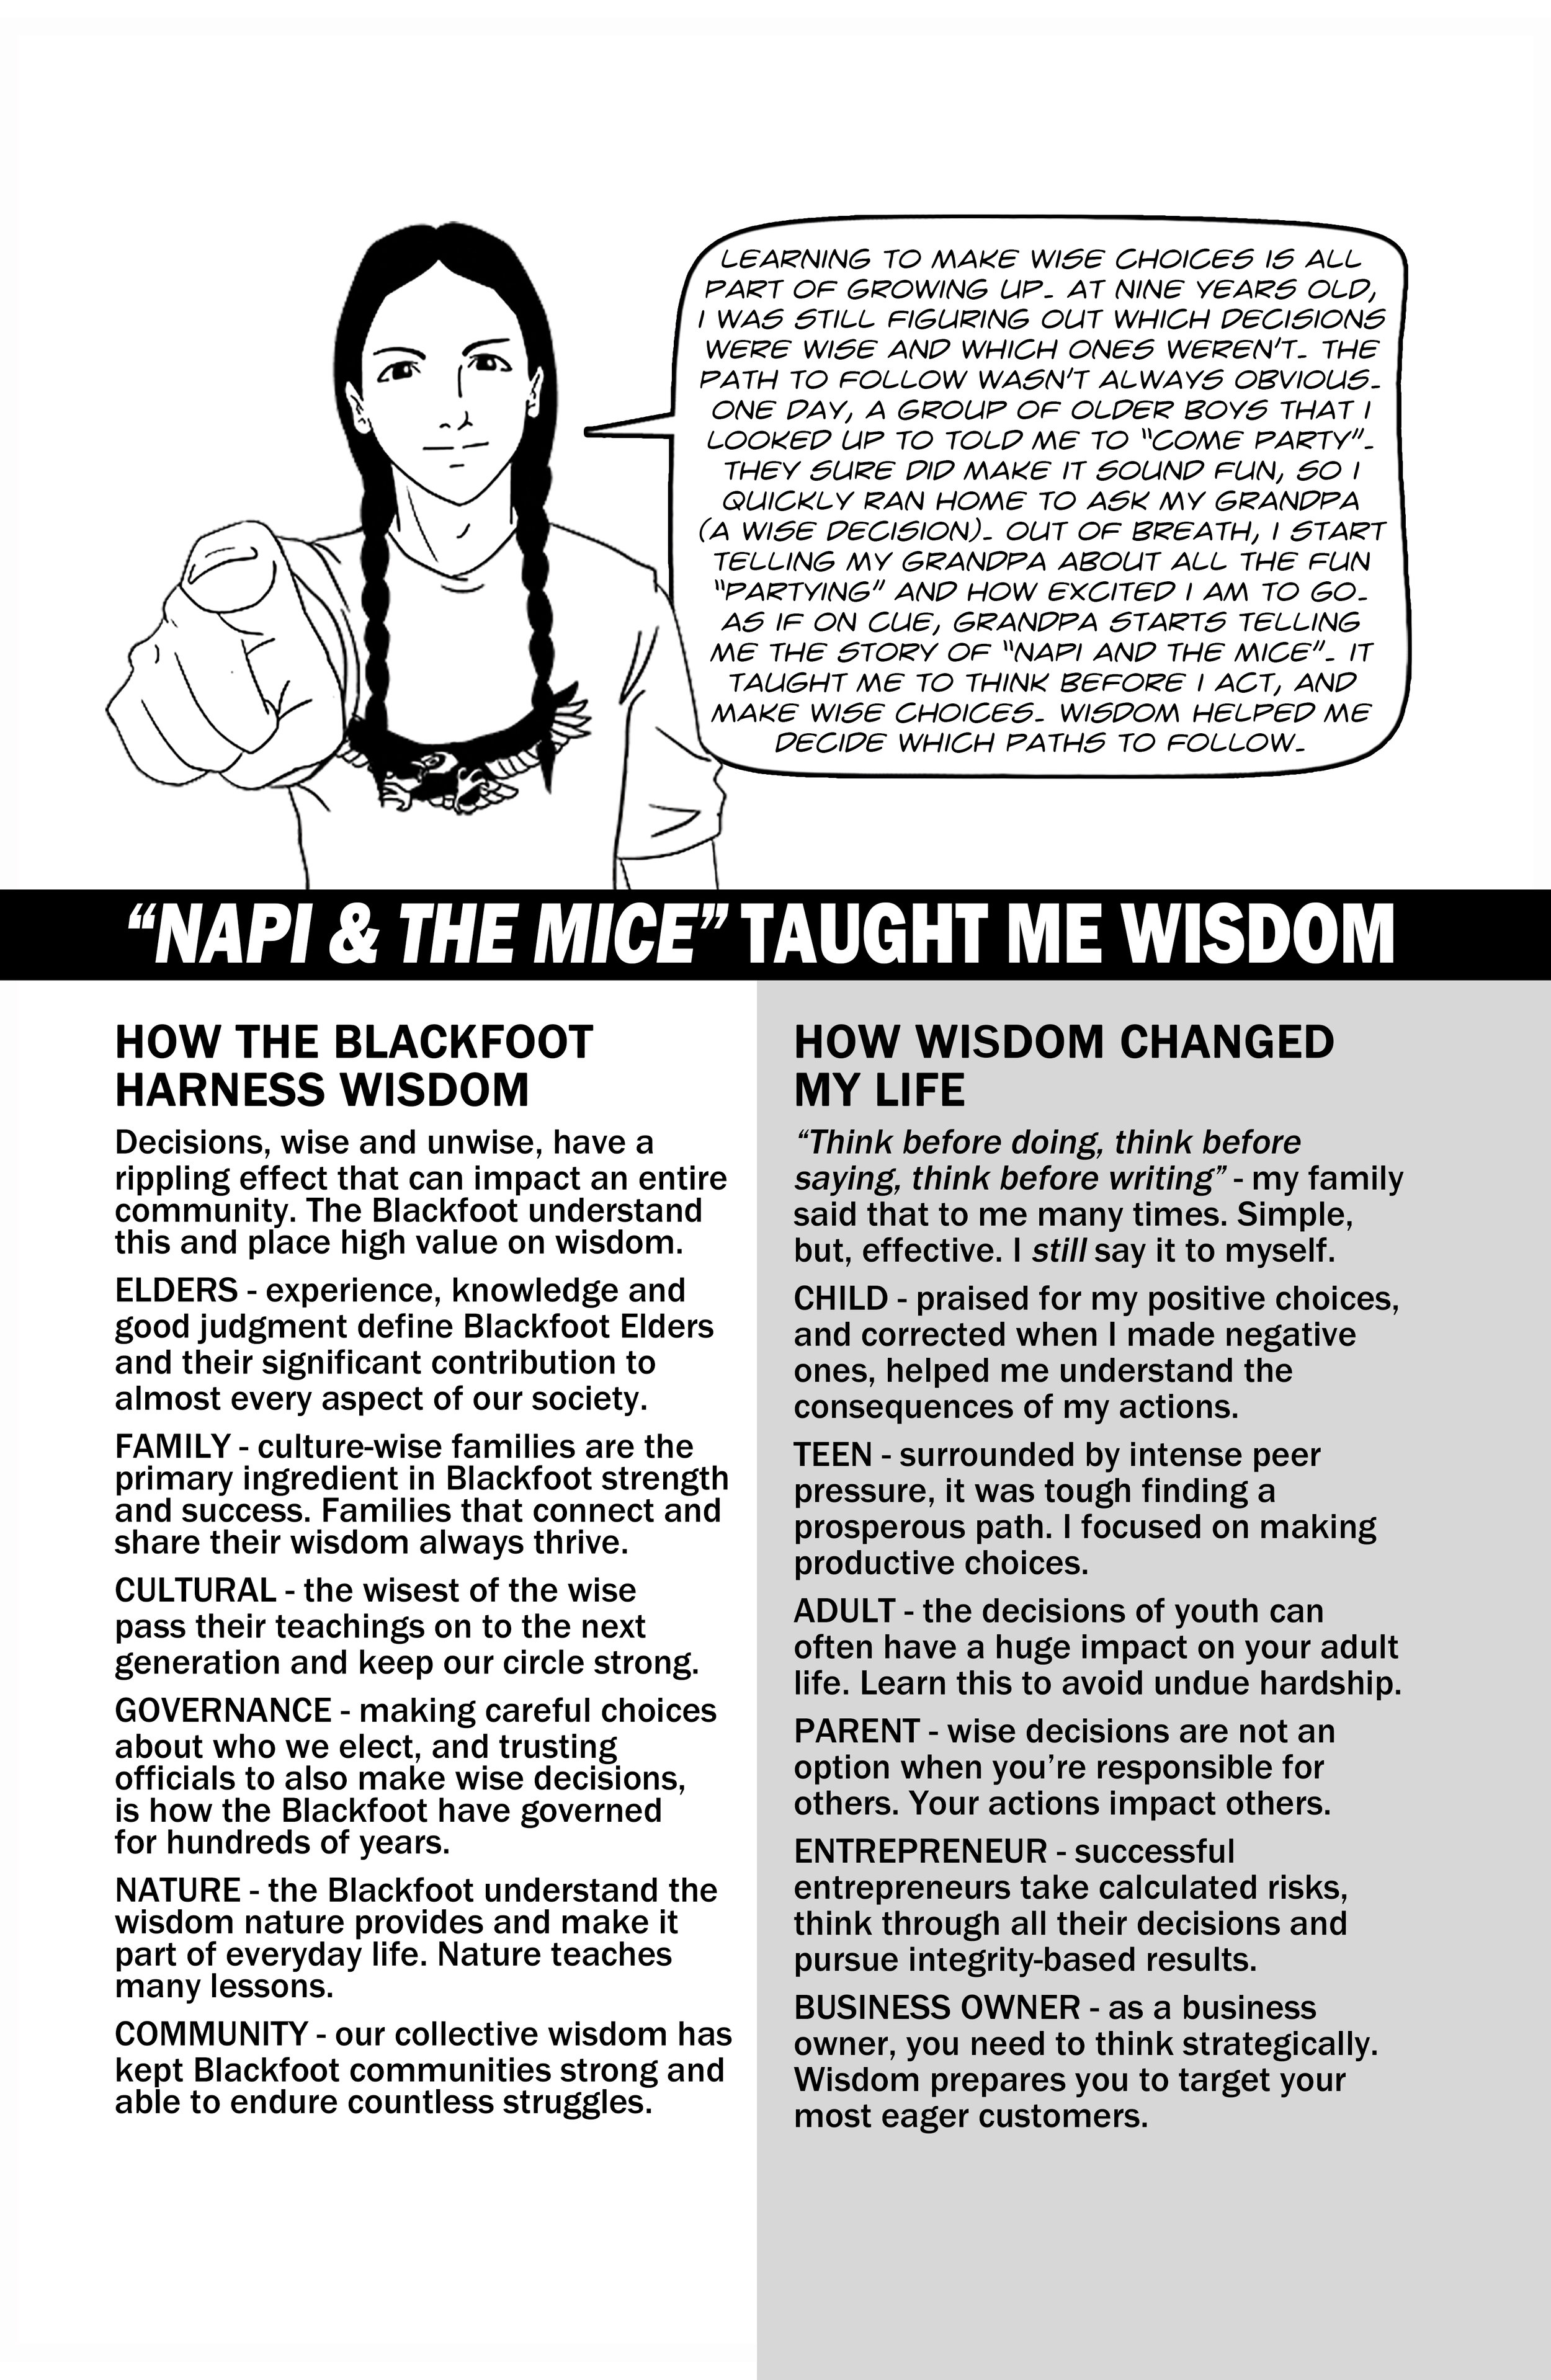 NAPI and The Mice5 (wisdom).jpg